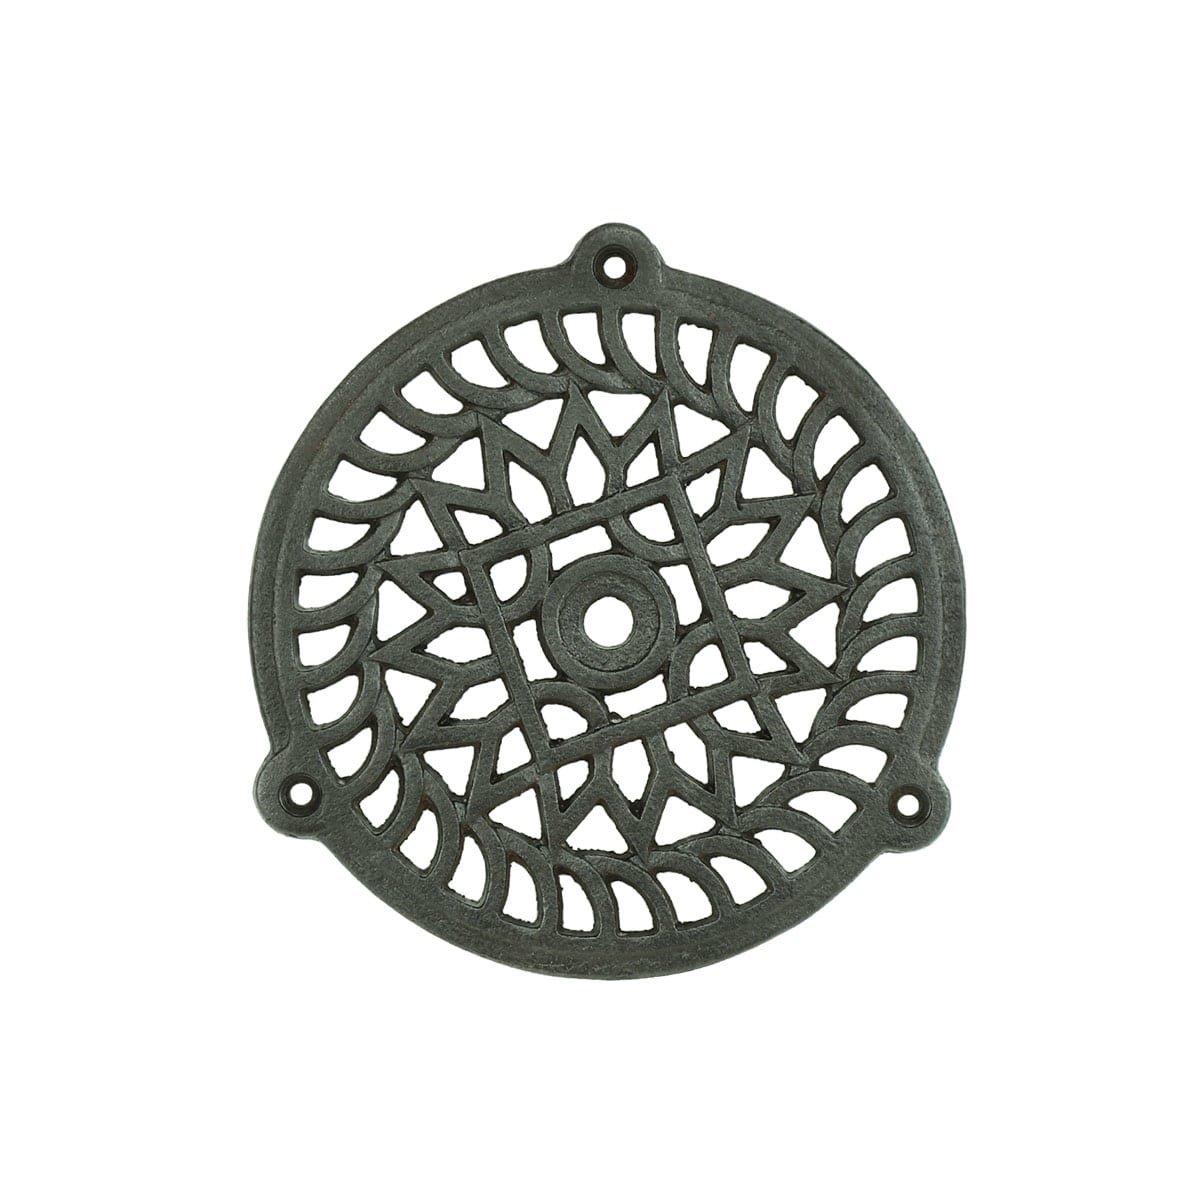 Hardware Grilles & Grates Door grille round cast iron Aßlar - Ø 110 mm